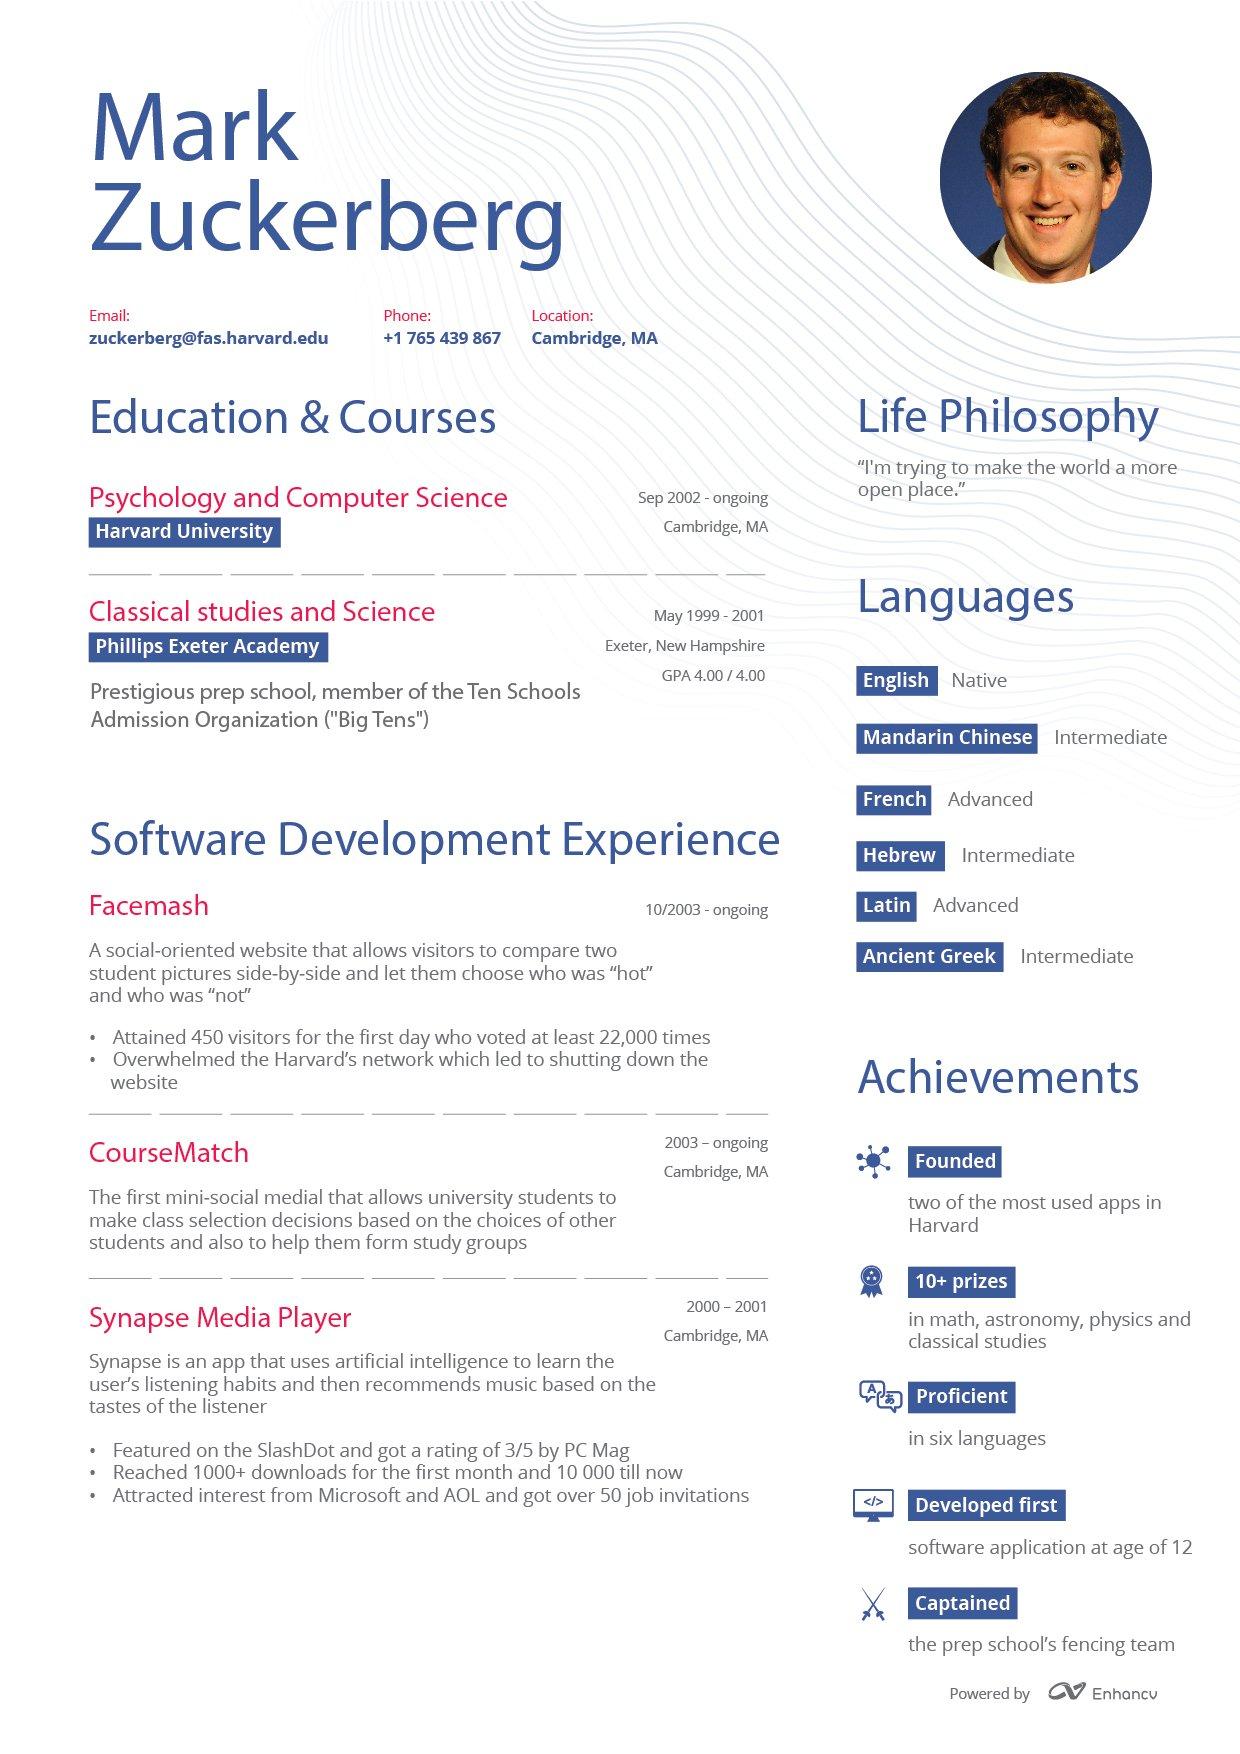 Zuckerberg-sayfa1